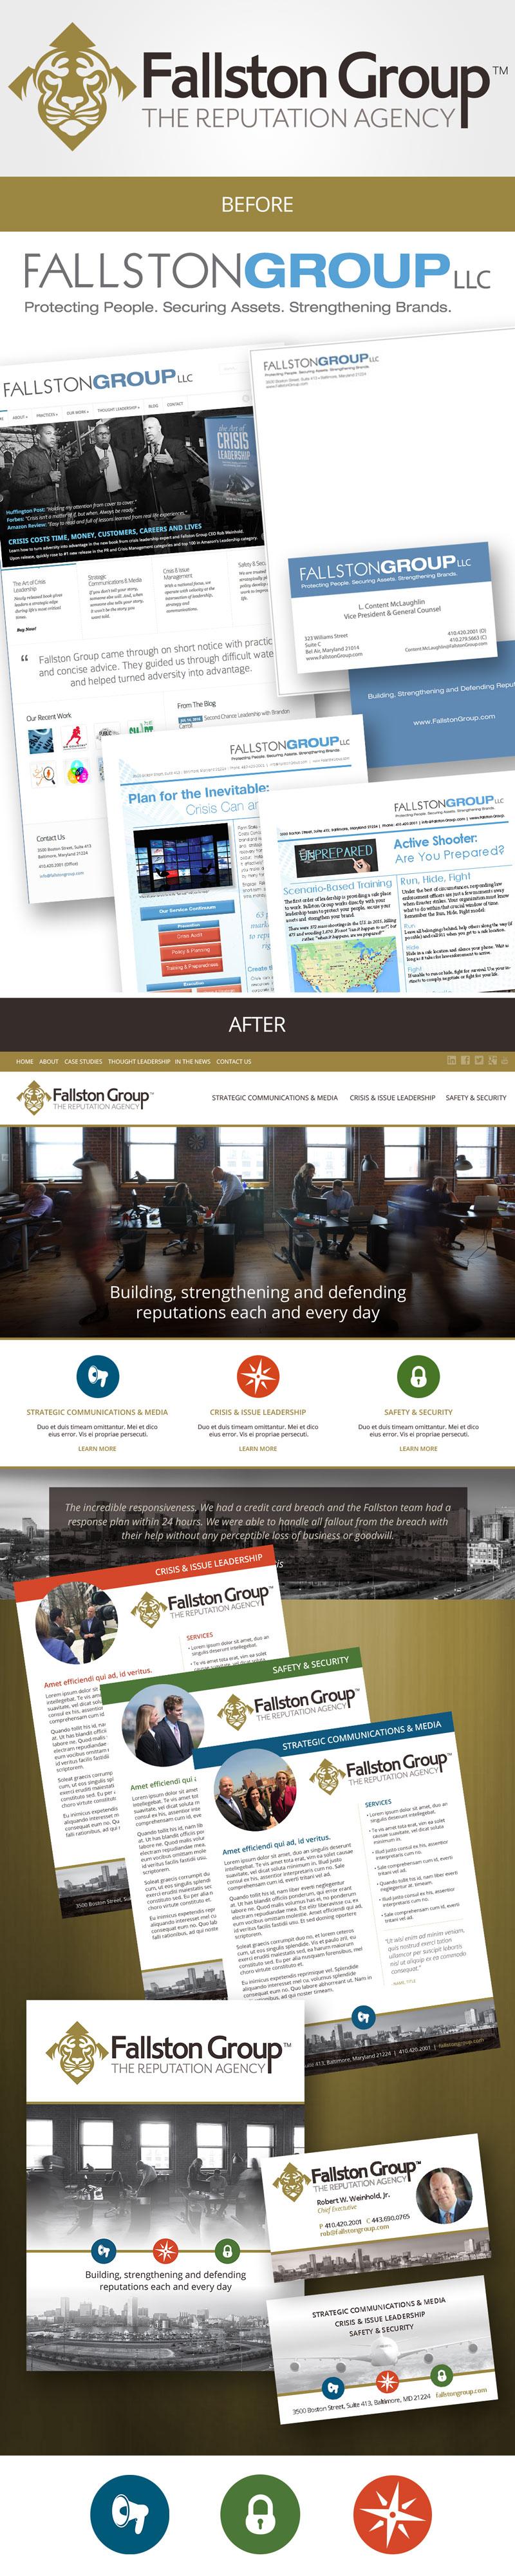 Fallston Group